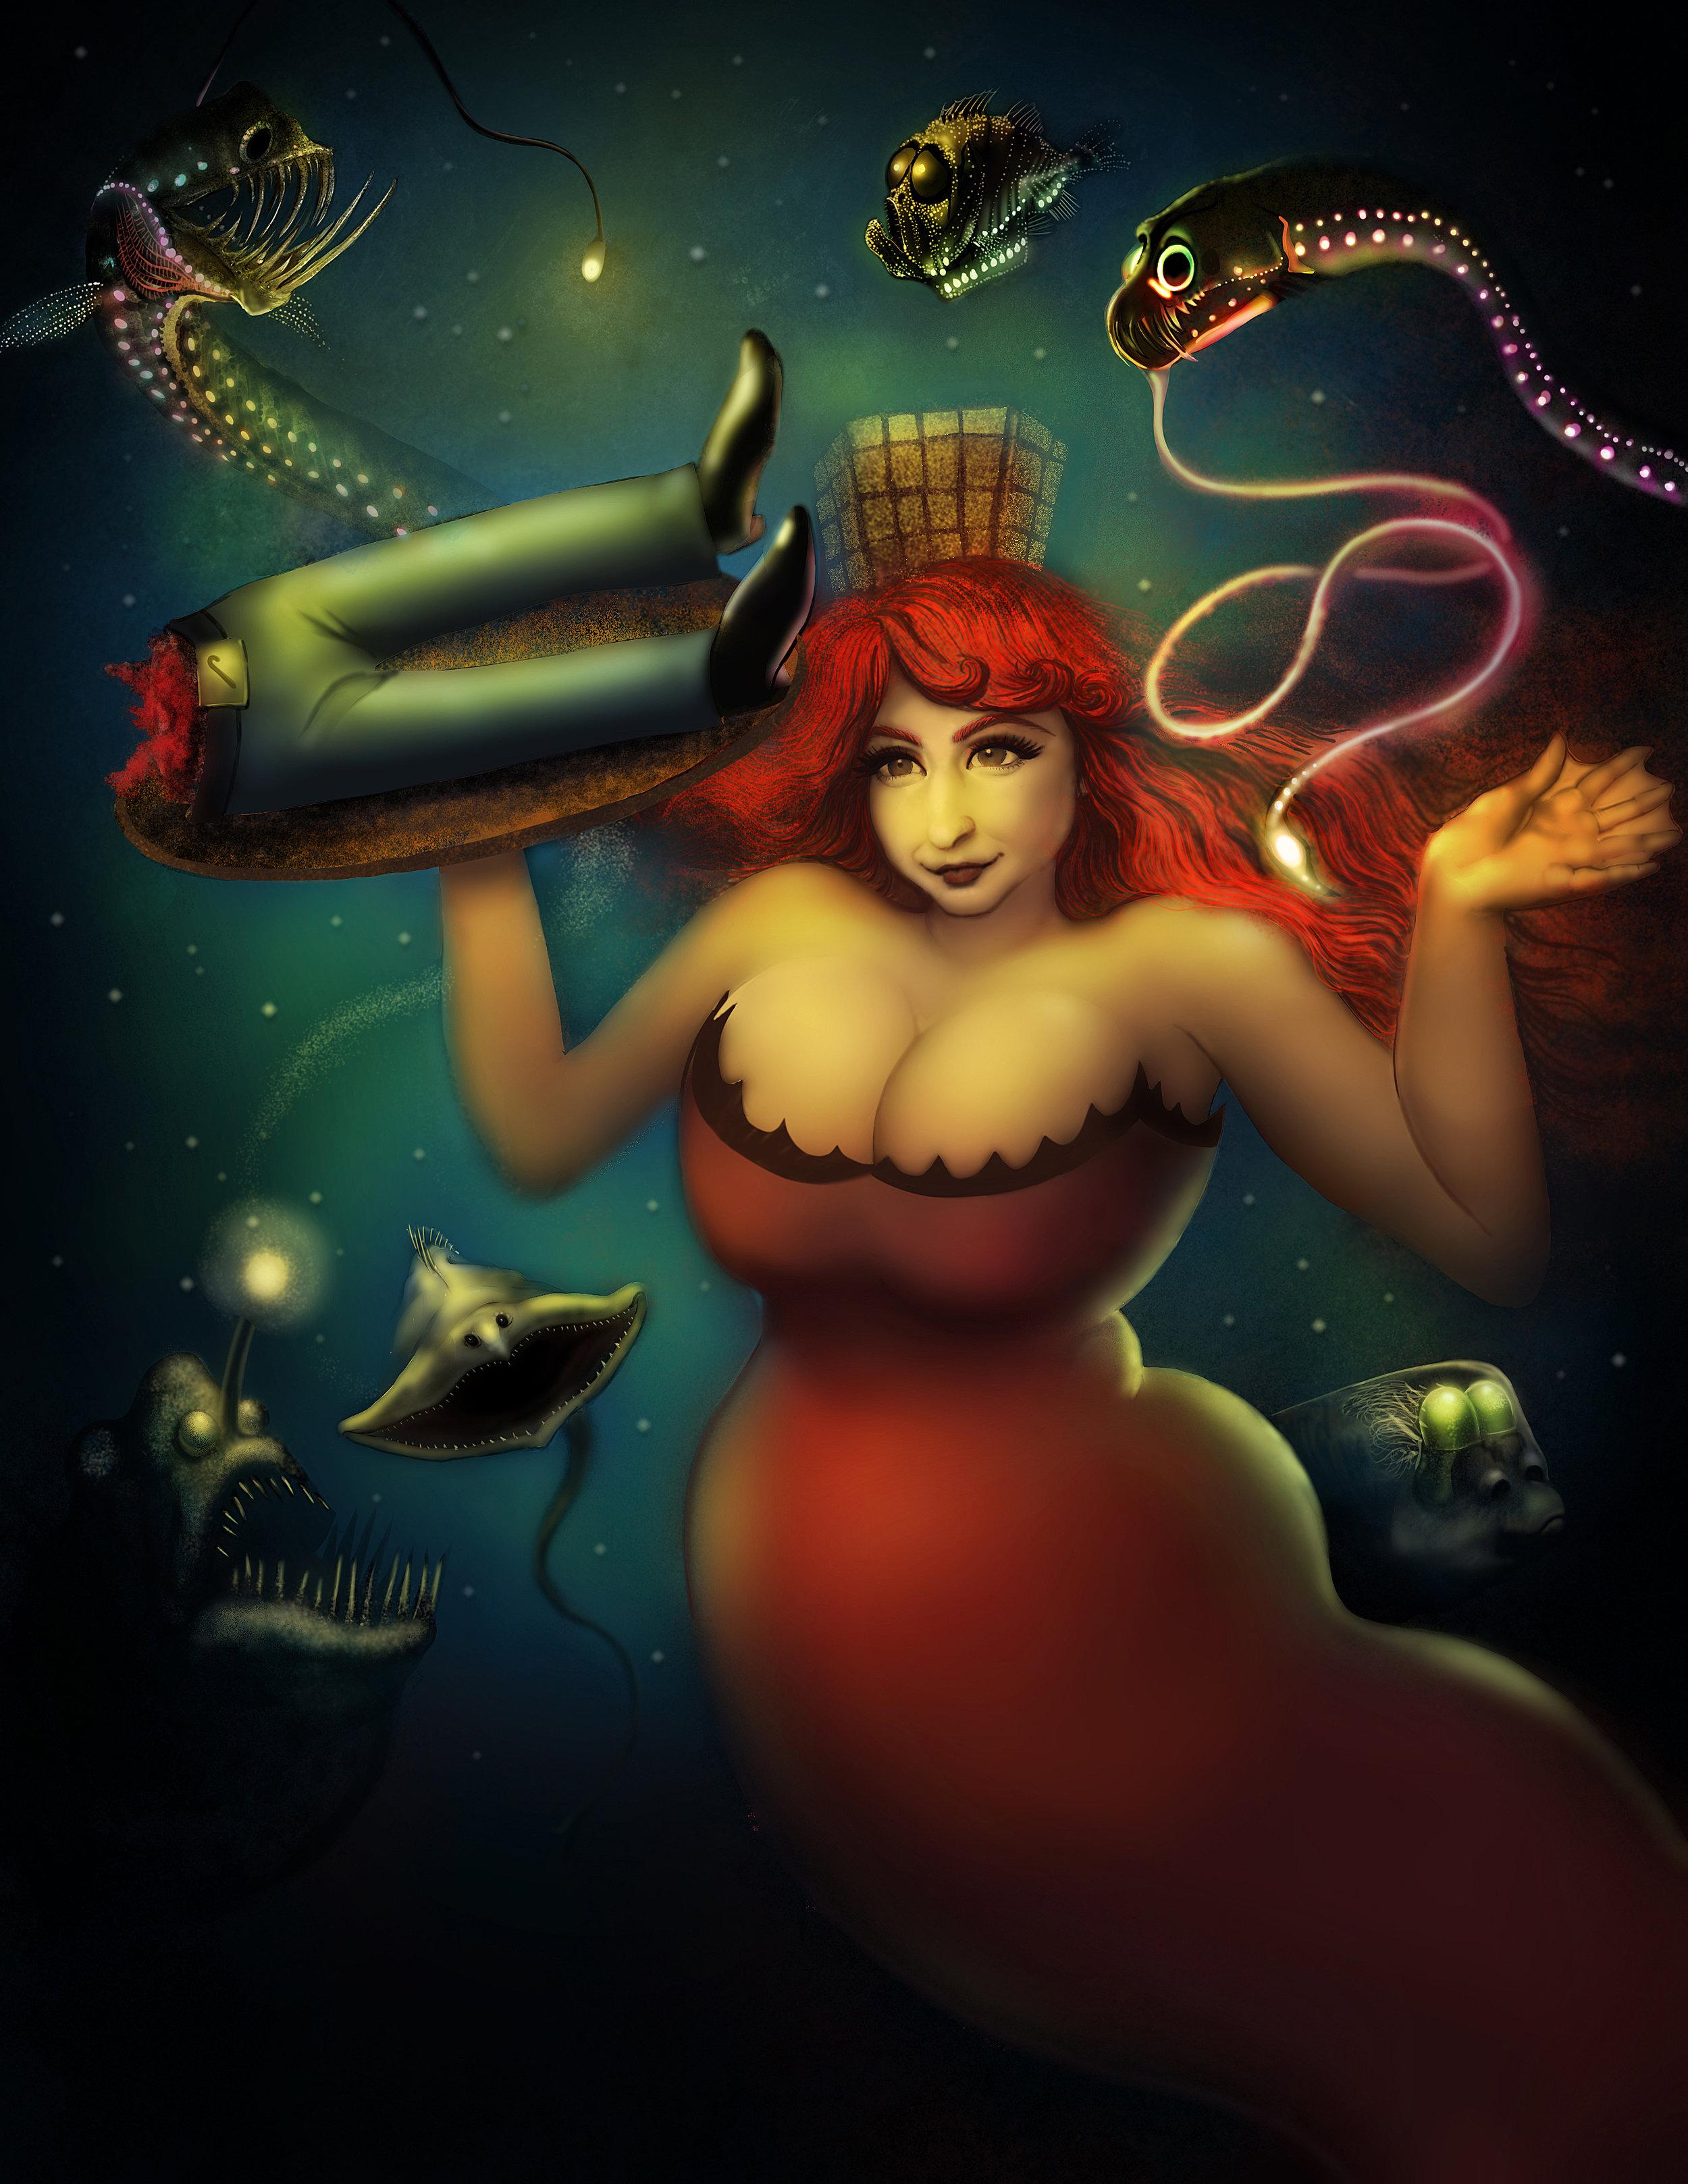 ATARGATIS–Digital painting. Illustration showing Syrian goddess and first mermaid, Atargatis.